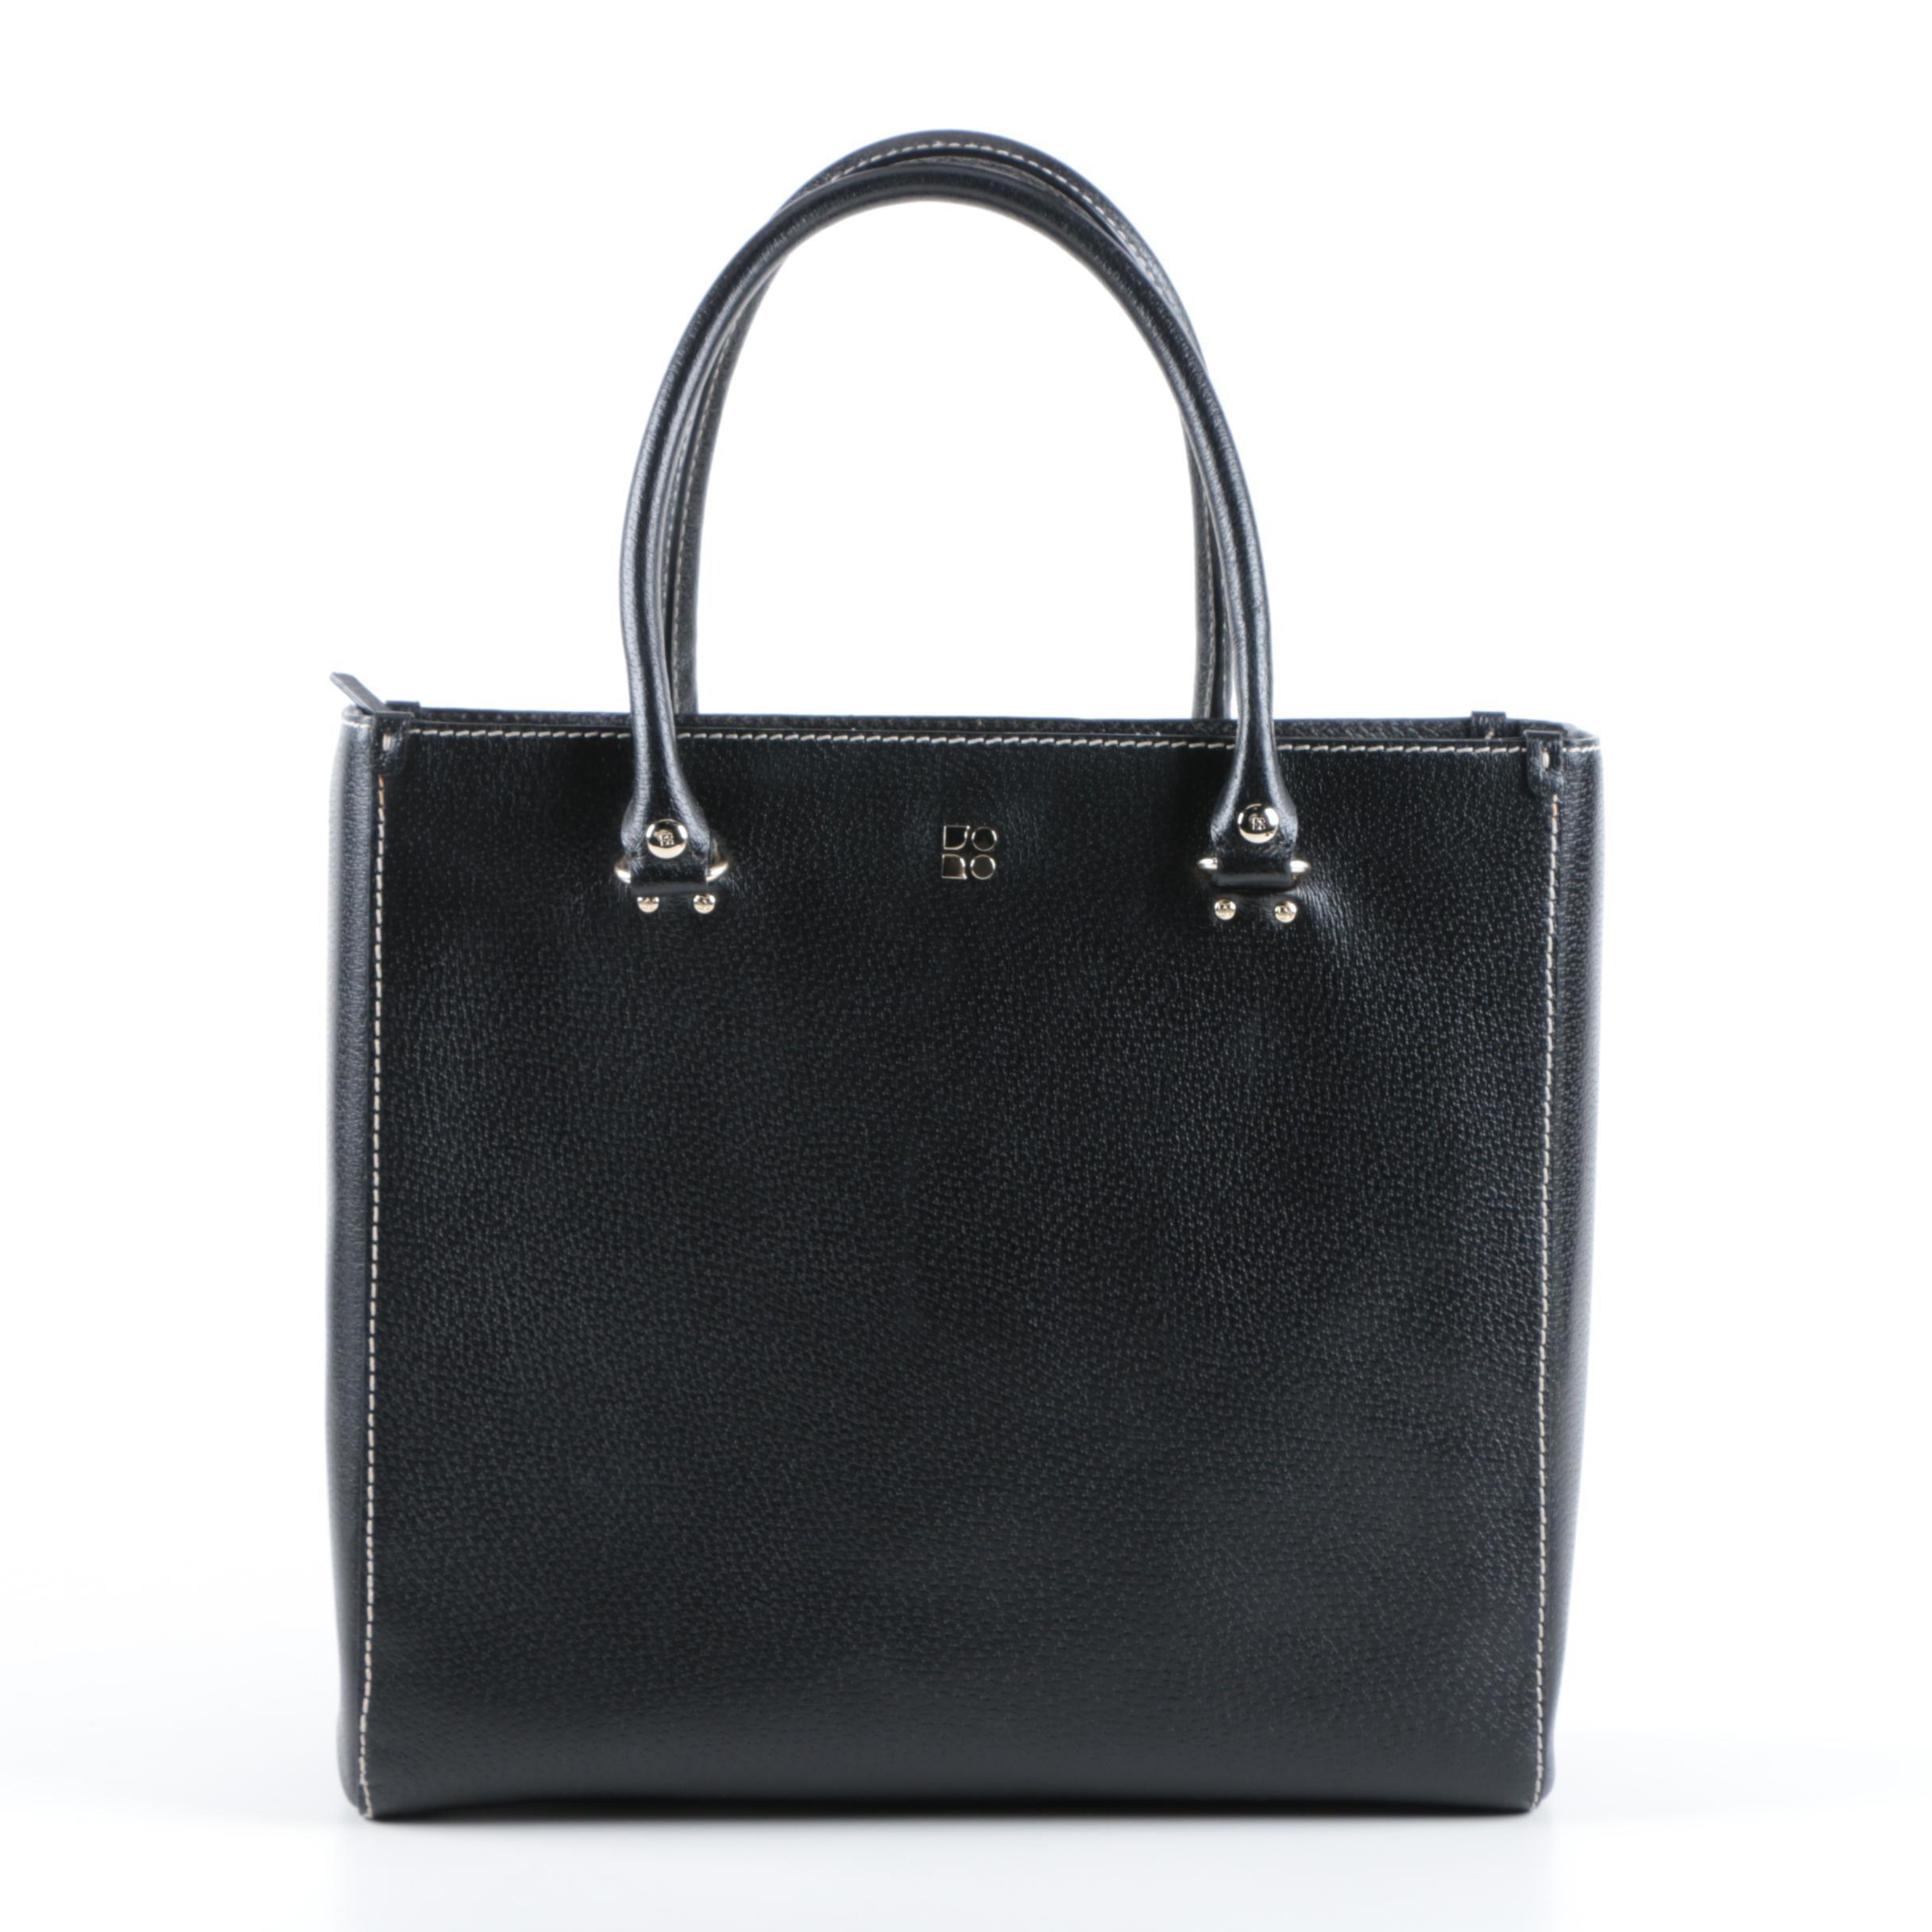 Kate Spade New York Black Leather Tote Handbag